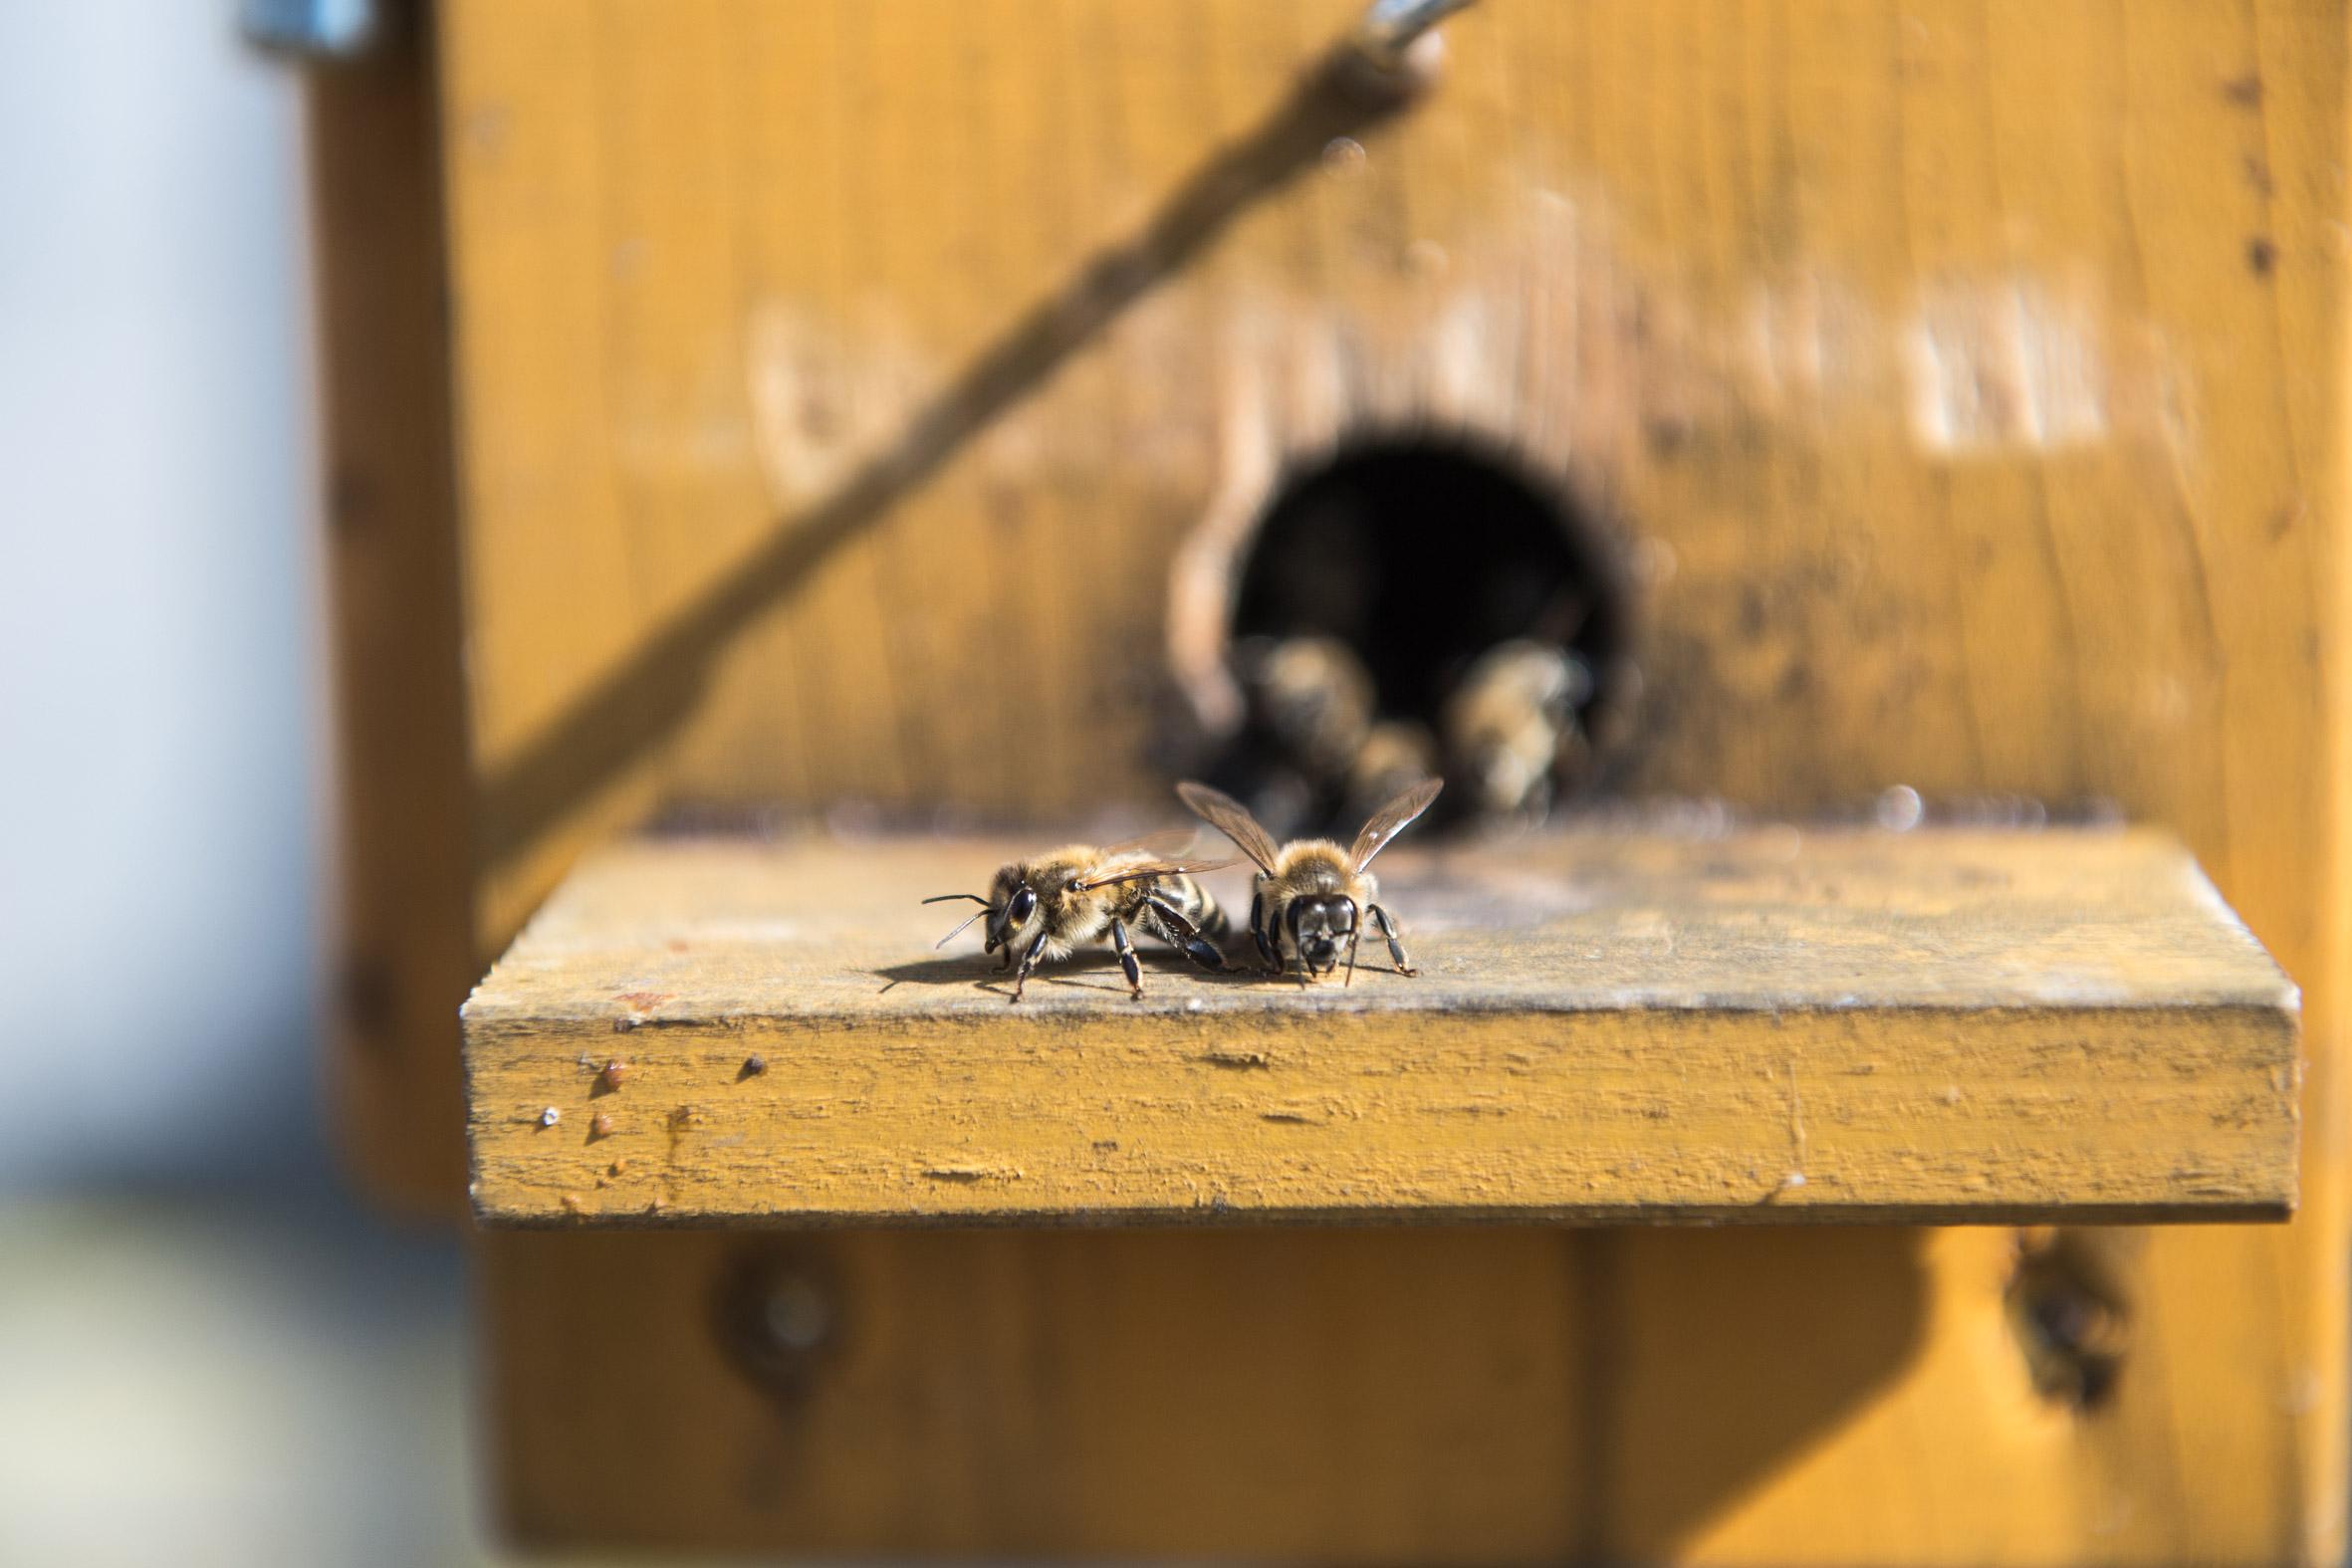 Imker Bienen regional leben